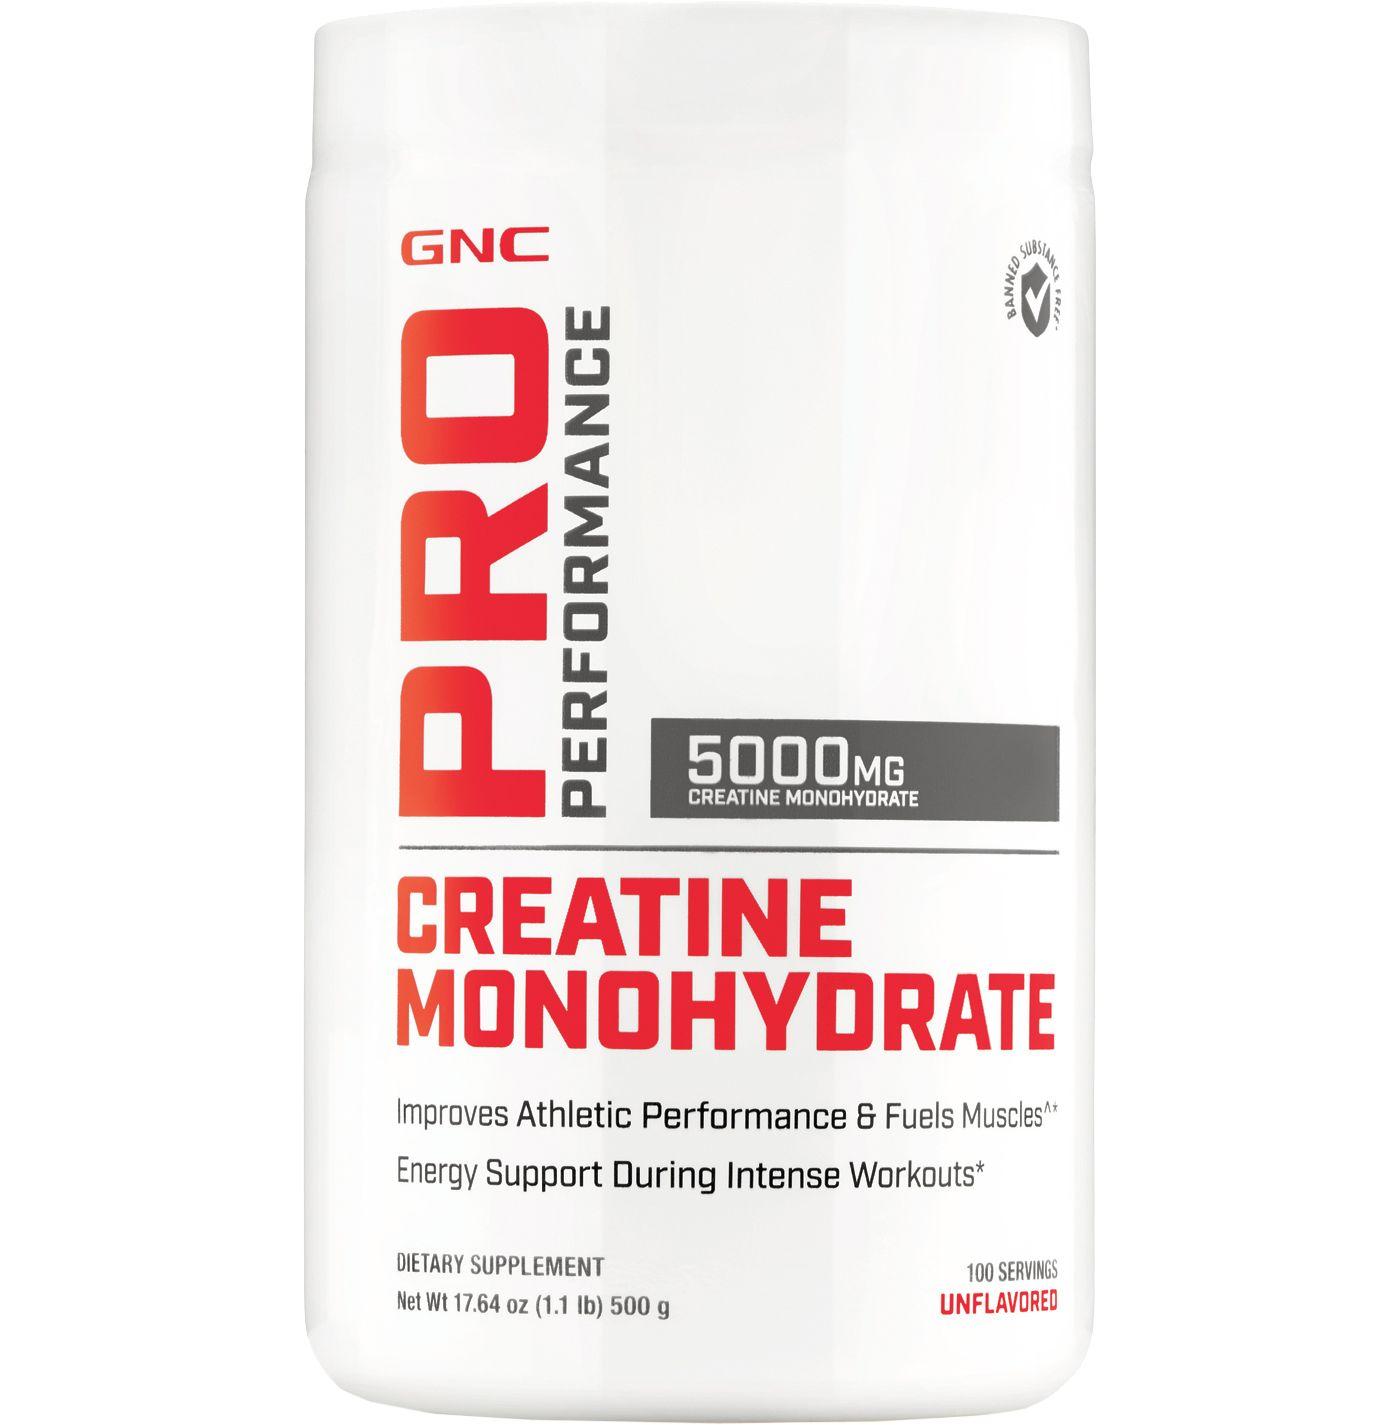 GNC Pro Performance Creatine Monohydrate 100 Servings